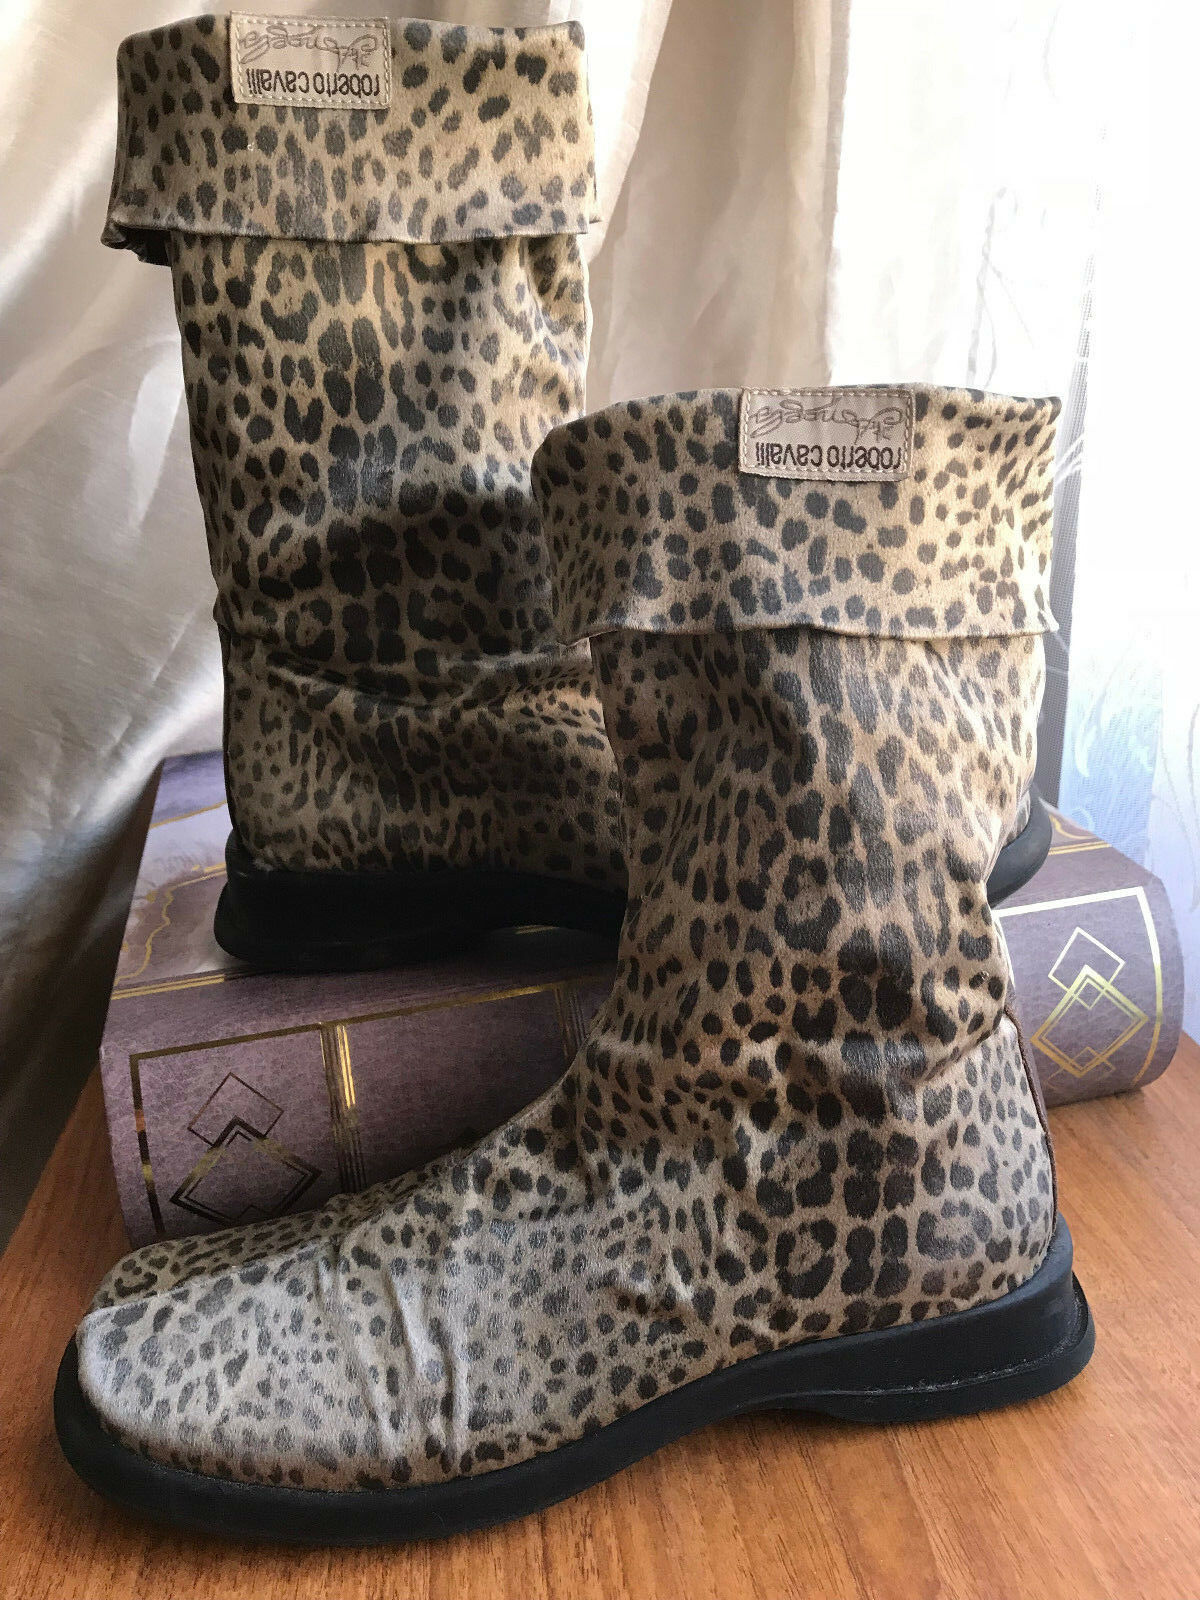 ROBERTO CAVALLI  ANGELS animal print elastic satin boots, size EU 38 UK 5, sandy